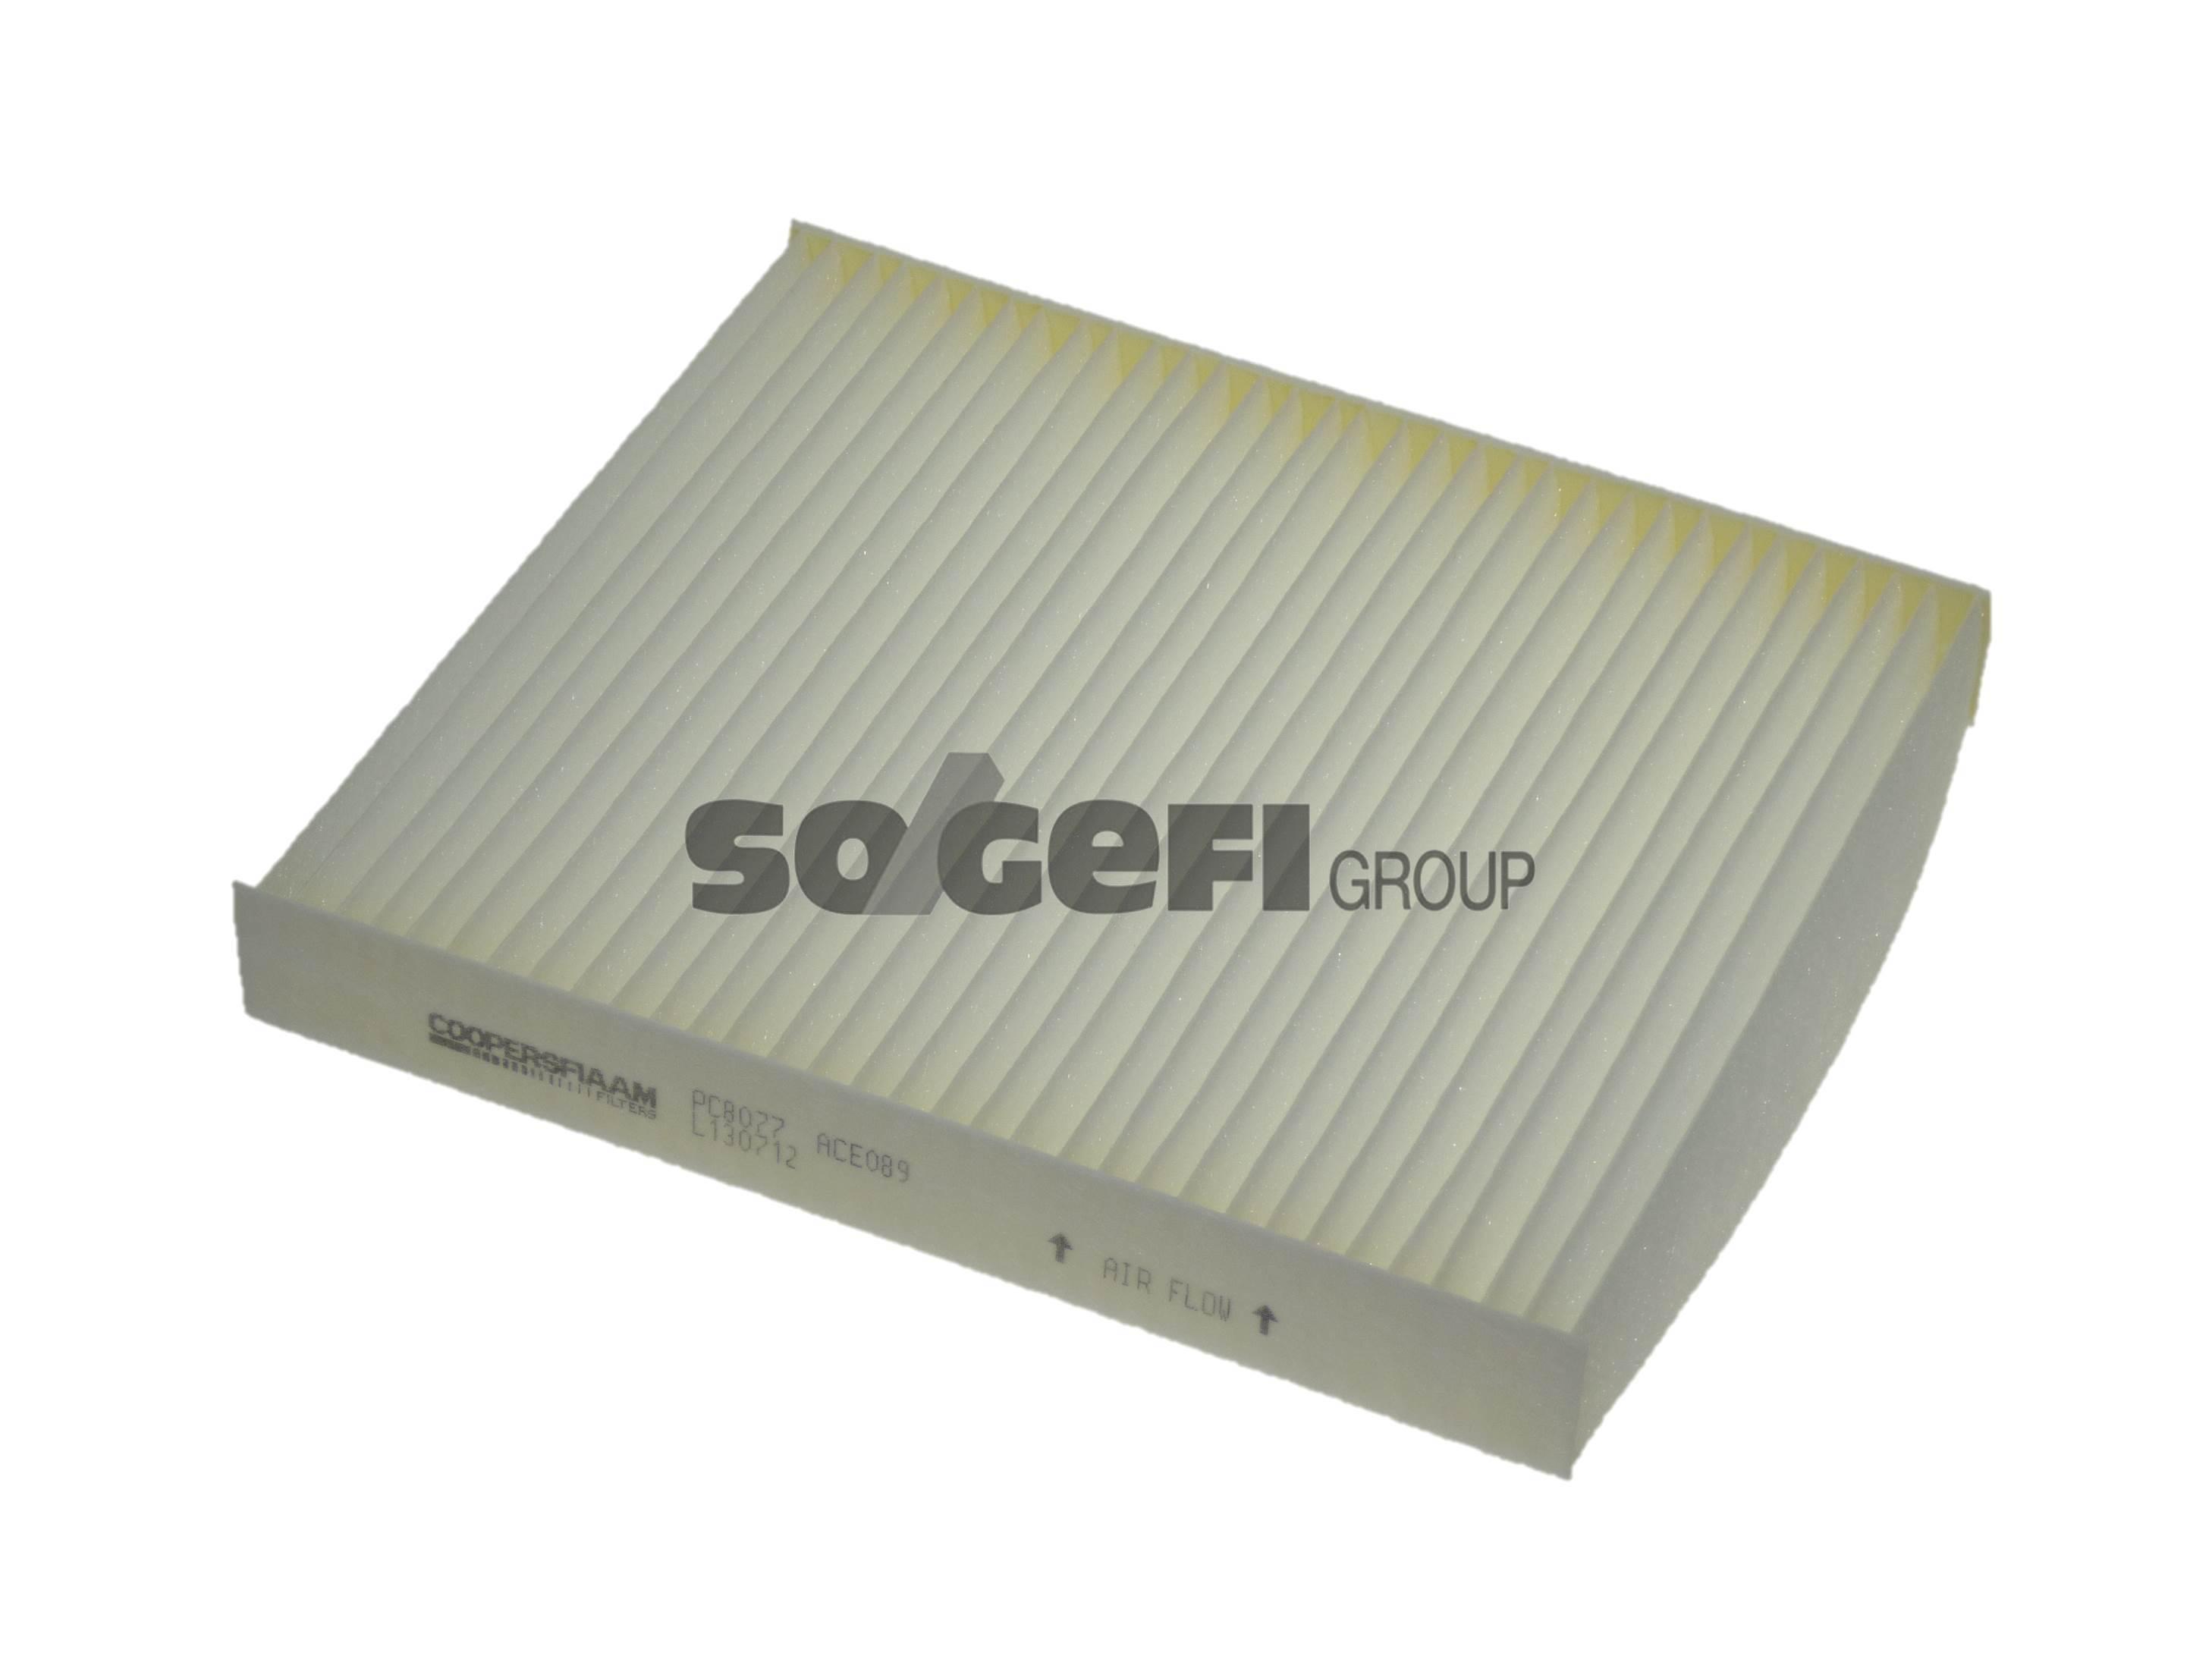 200cm Viviance 2M//3M 7 Pin Trailer Light Board Extension Cable Lead Truck Plug Socket Wire Part